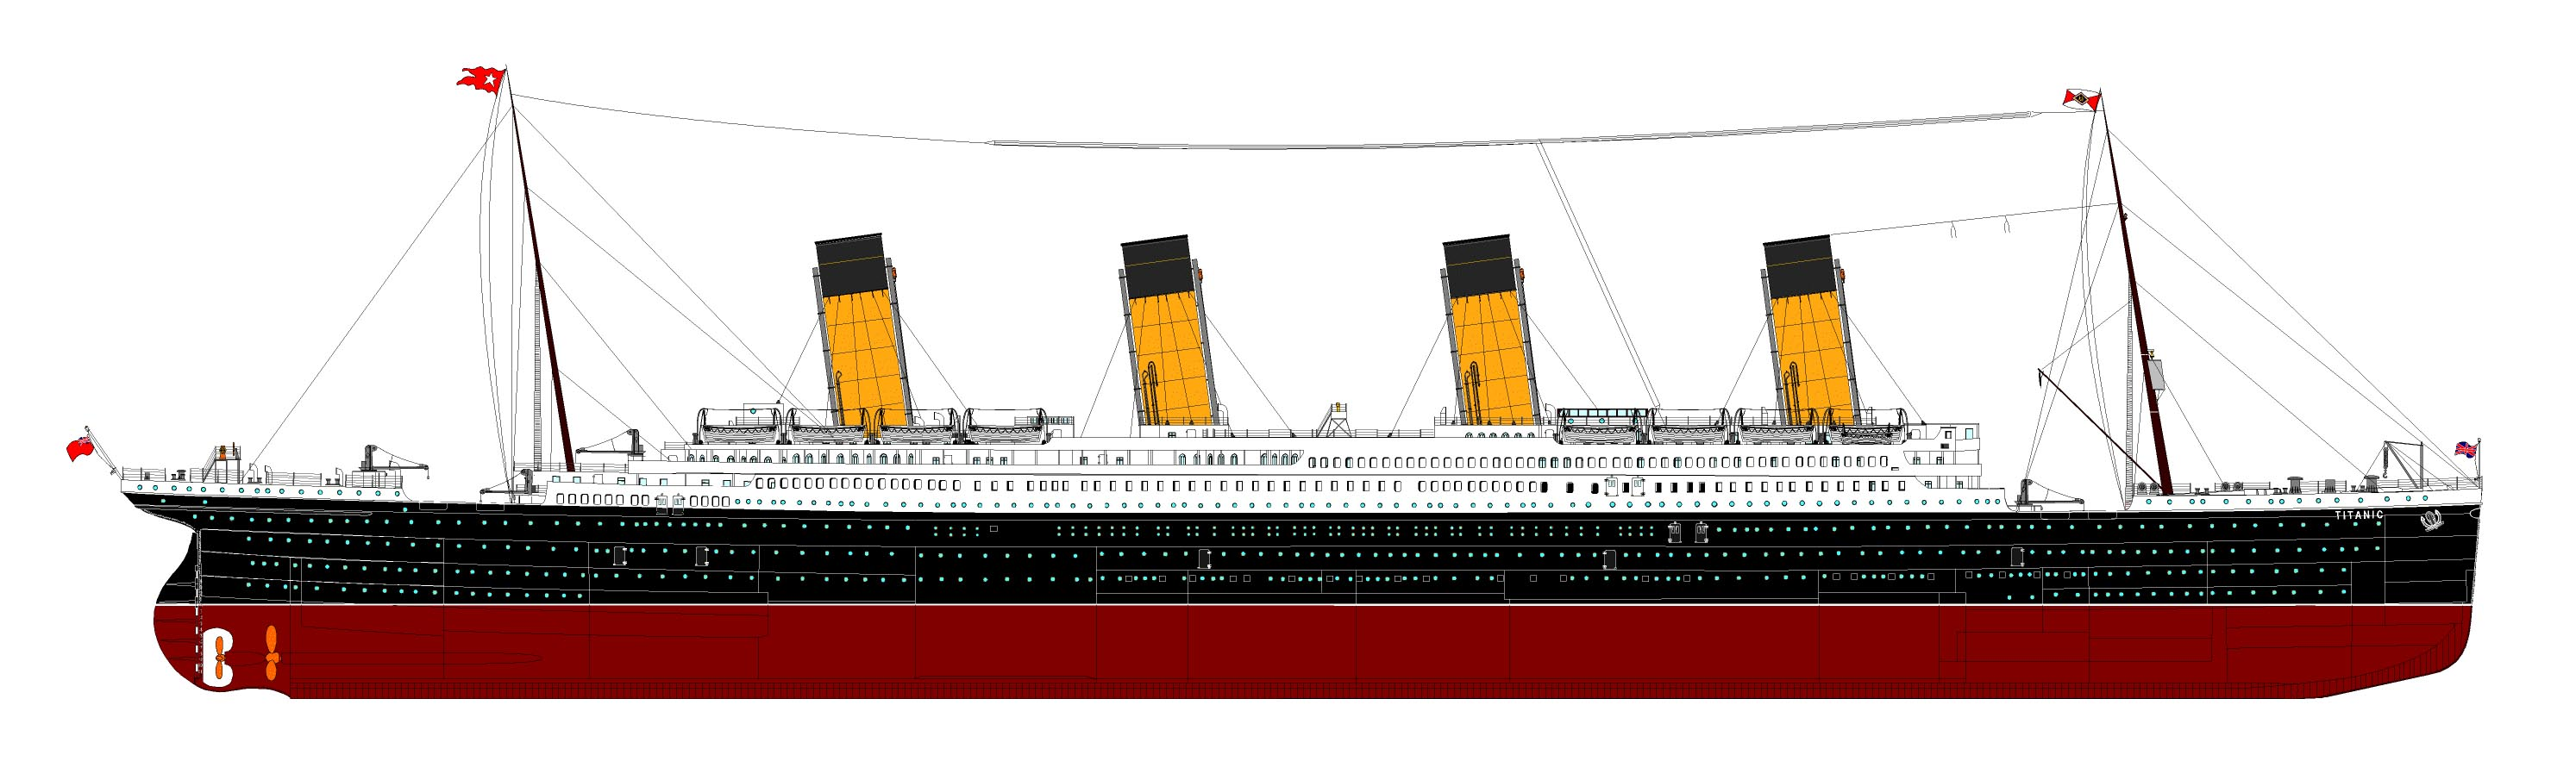 titanic planning